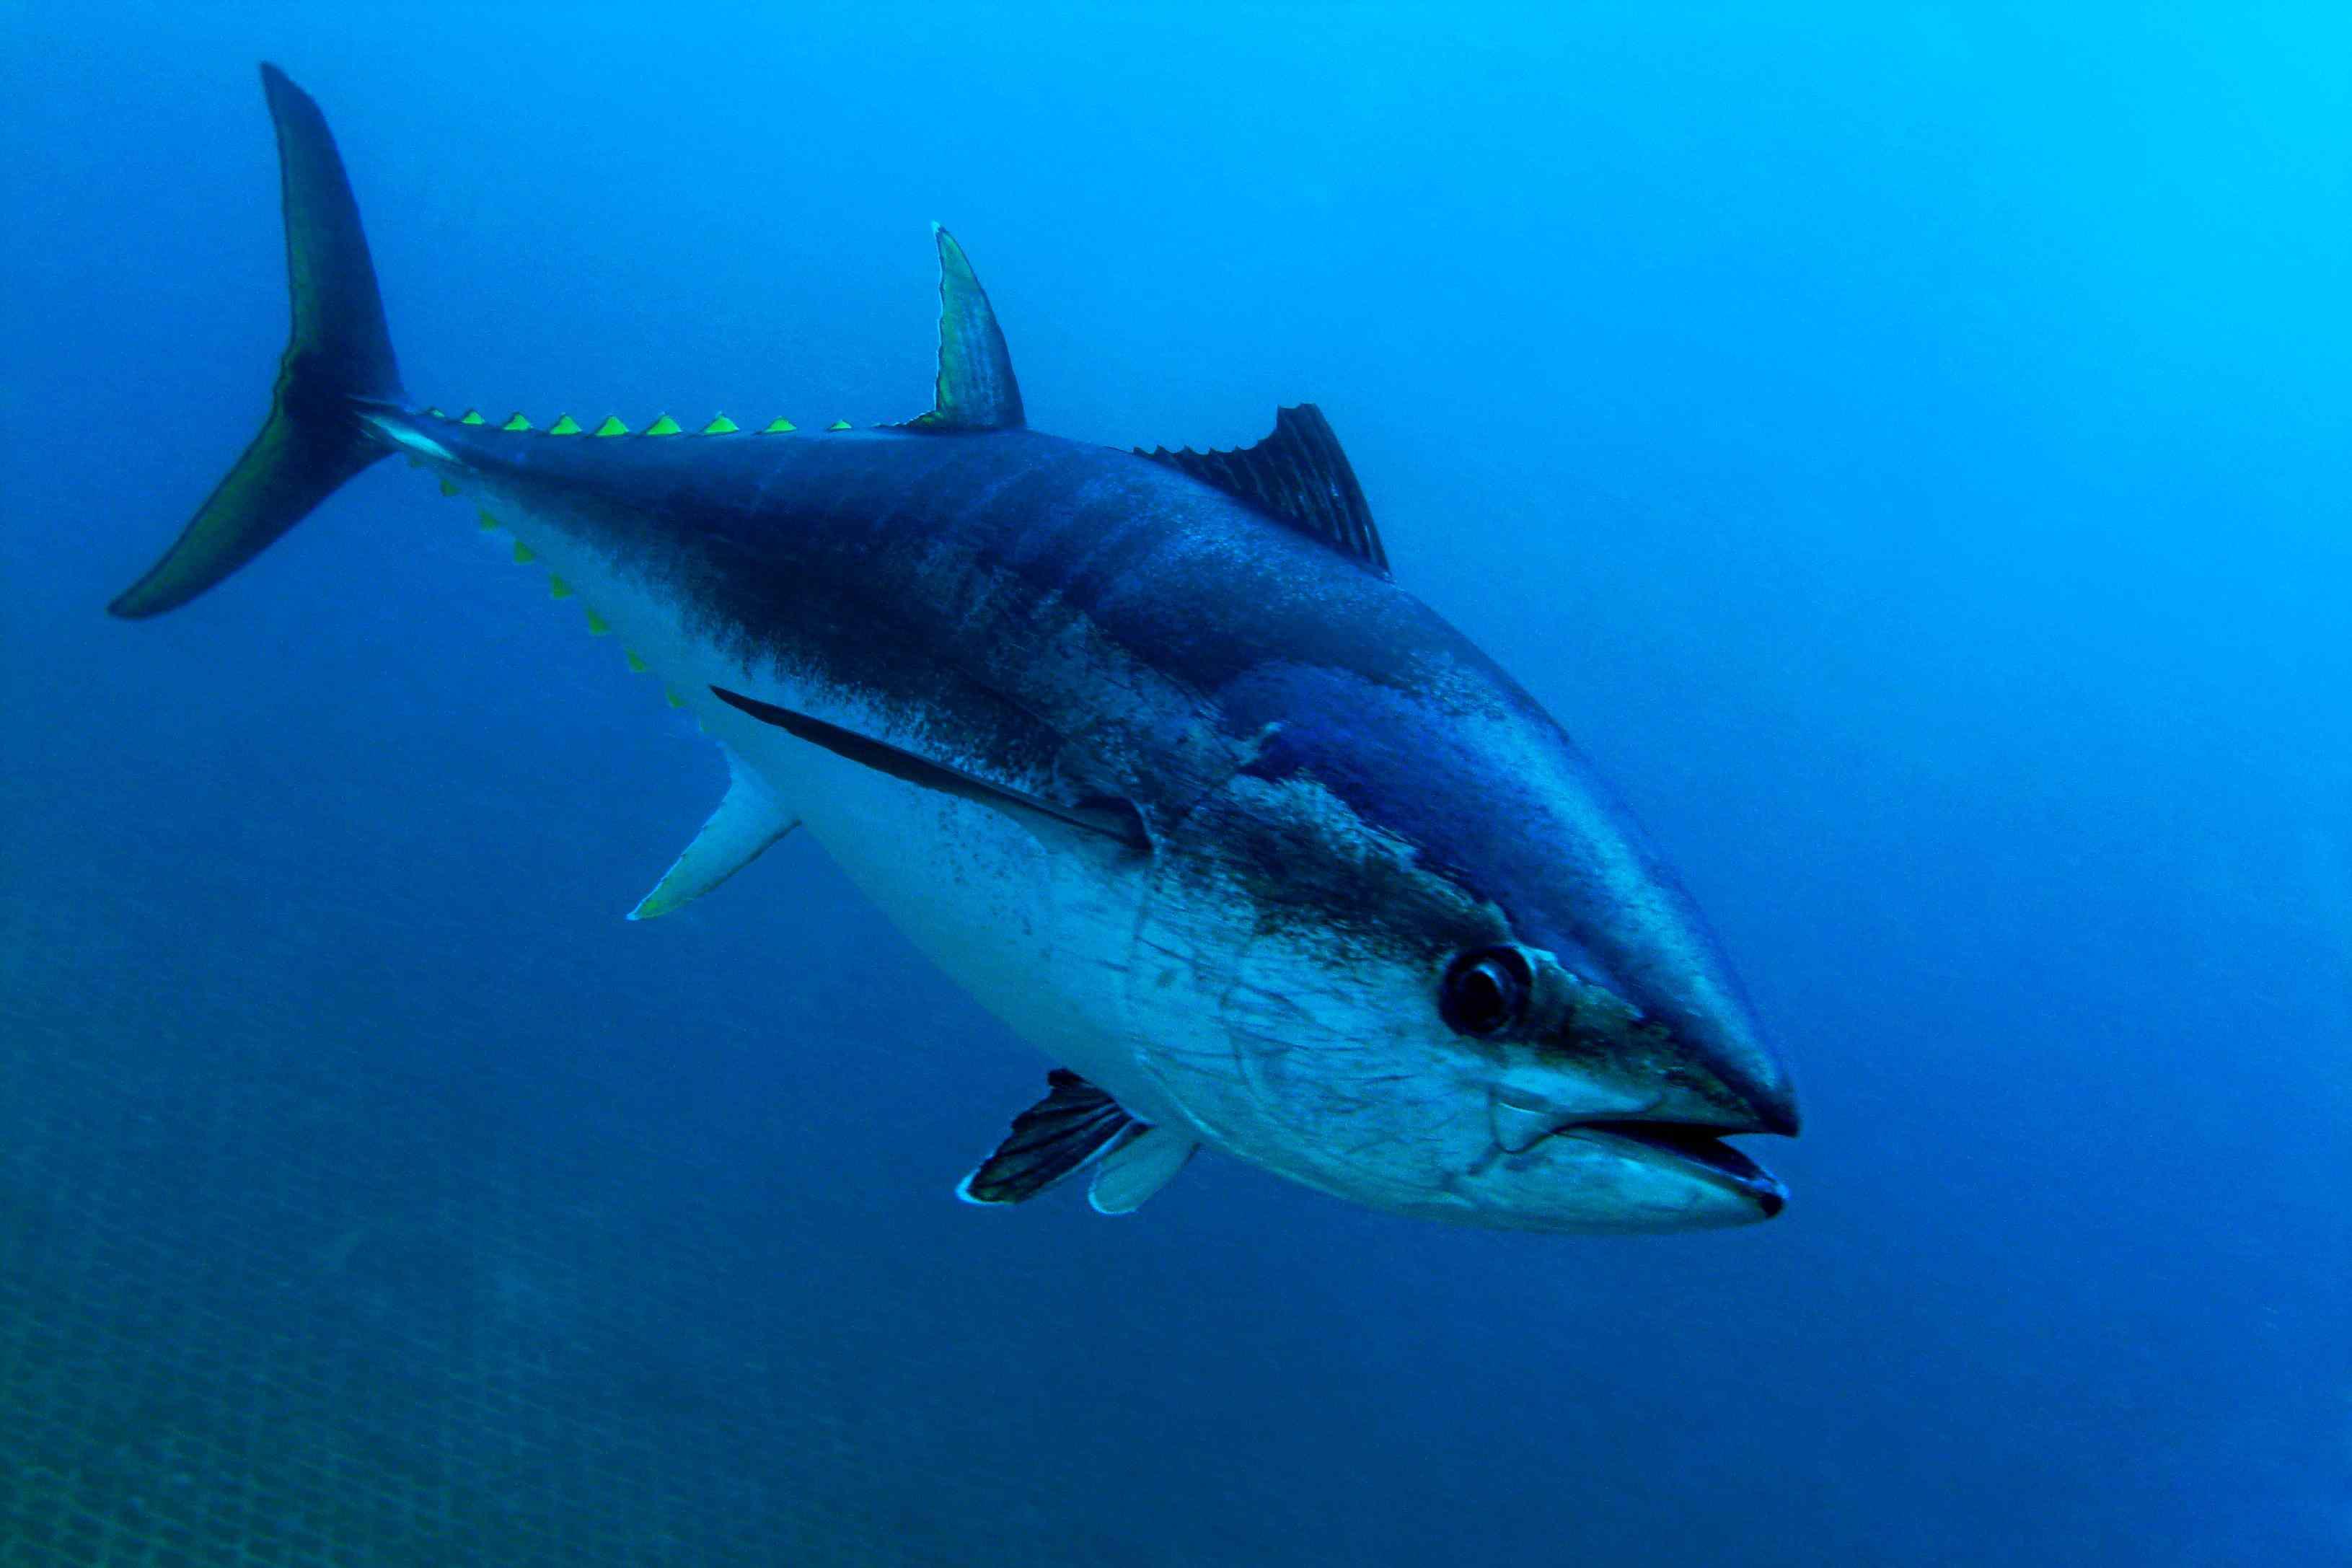 underwater closeup of bluefin tuna swimming to the right